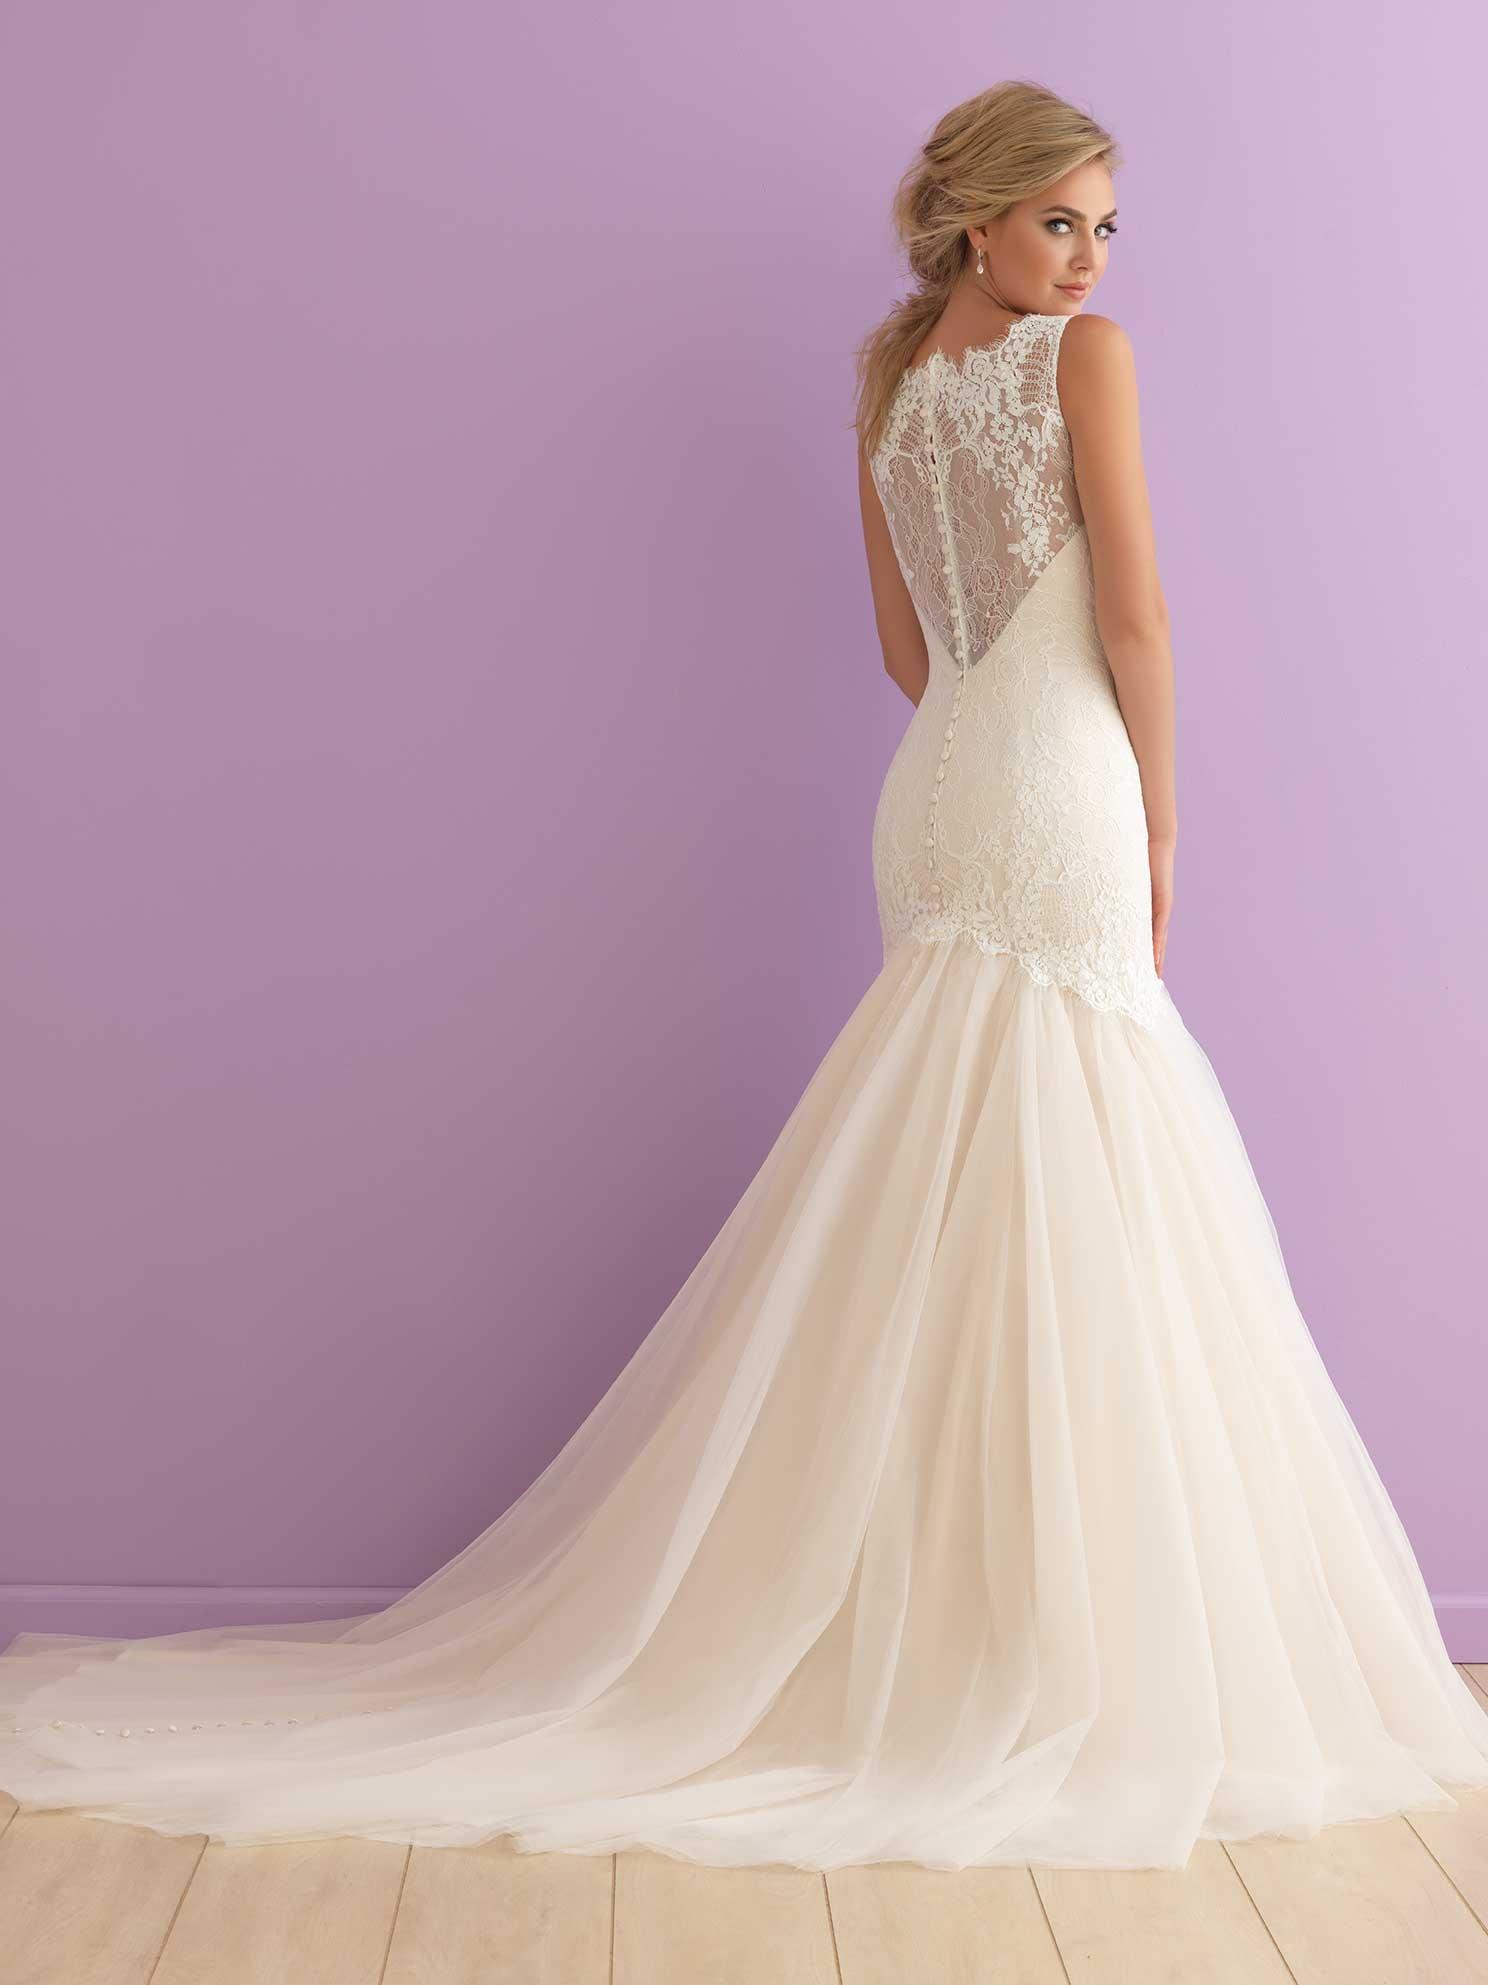 Allure Romance 2911 Ivory Size 12 Eleganza Tuxedo Bridal Gallery